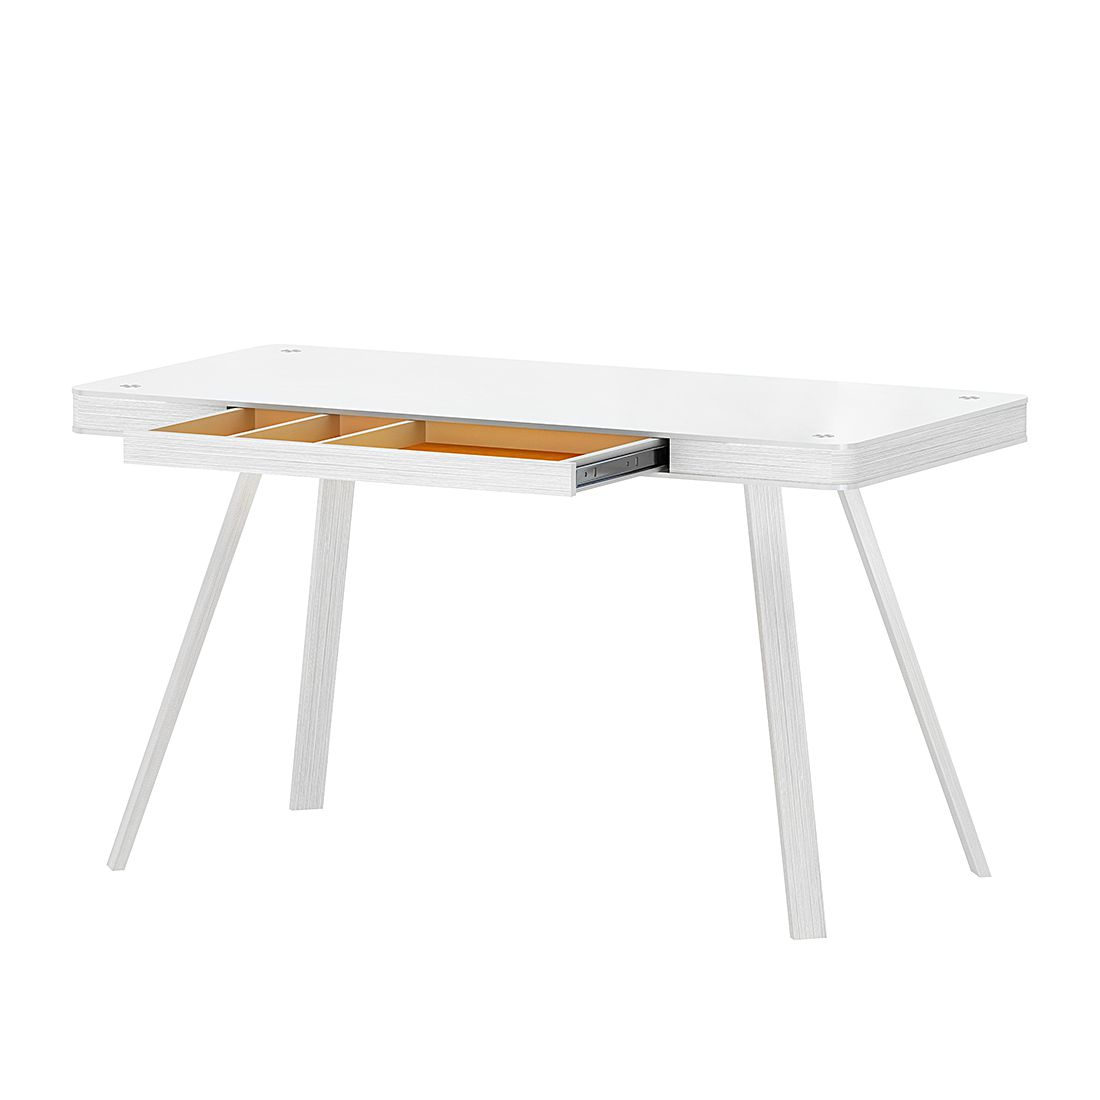 Home 24 - Bureau d angle smart desk - blanc, loftscape